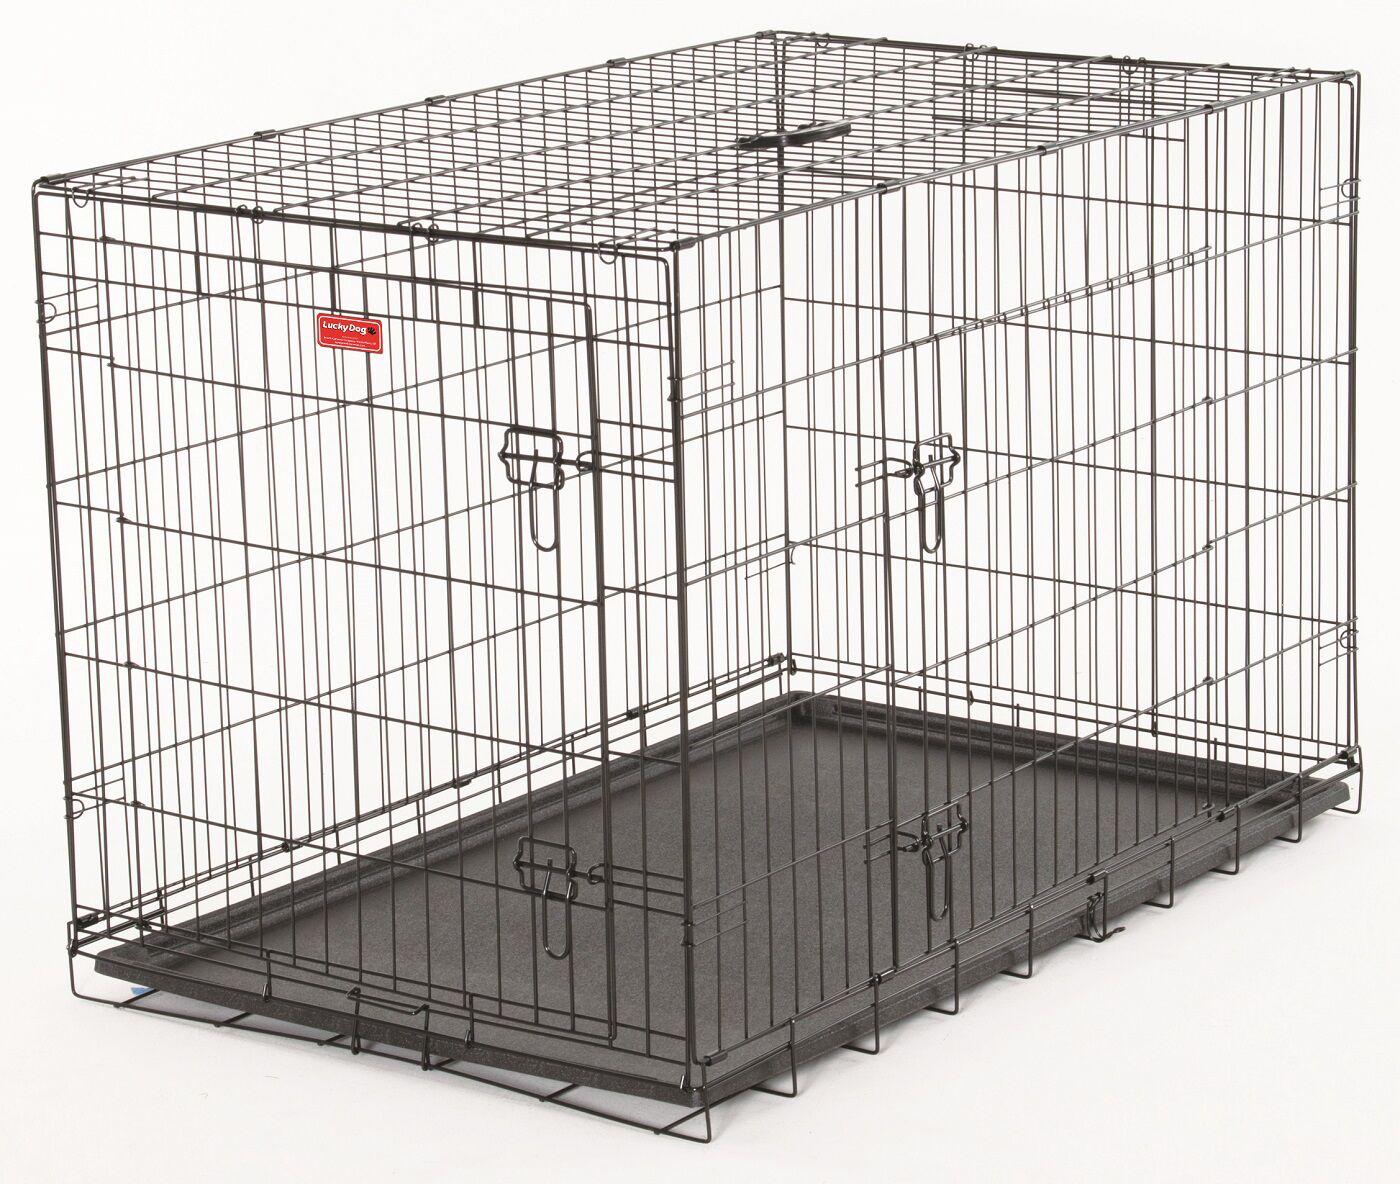 Quincy Lucky Dog 2 Door Training Crate Size: 33